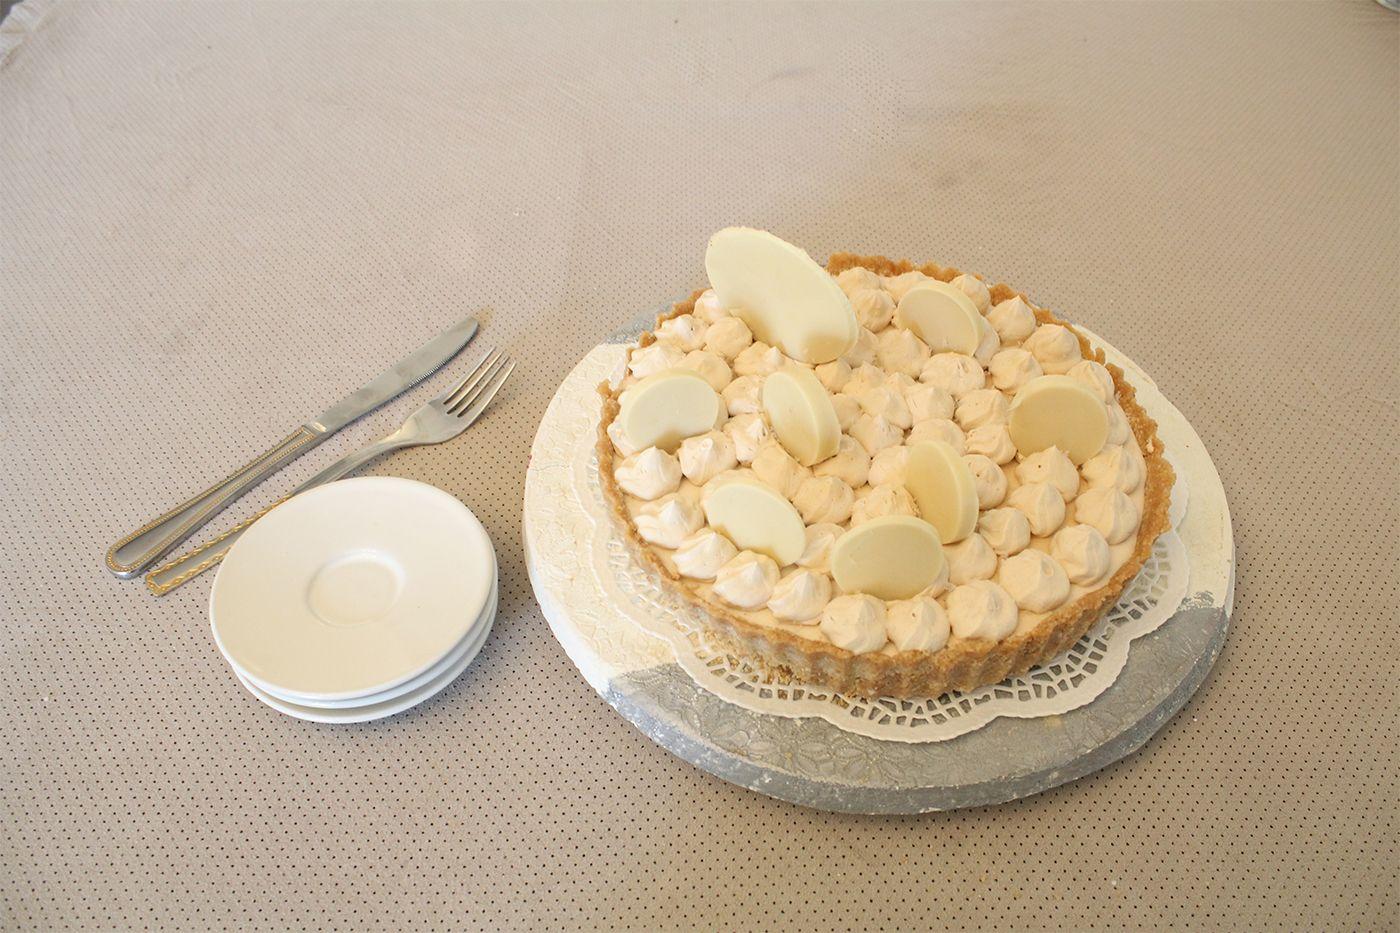 IMG 3295 - עוגת גבינה ללא אפיה